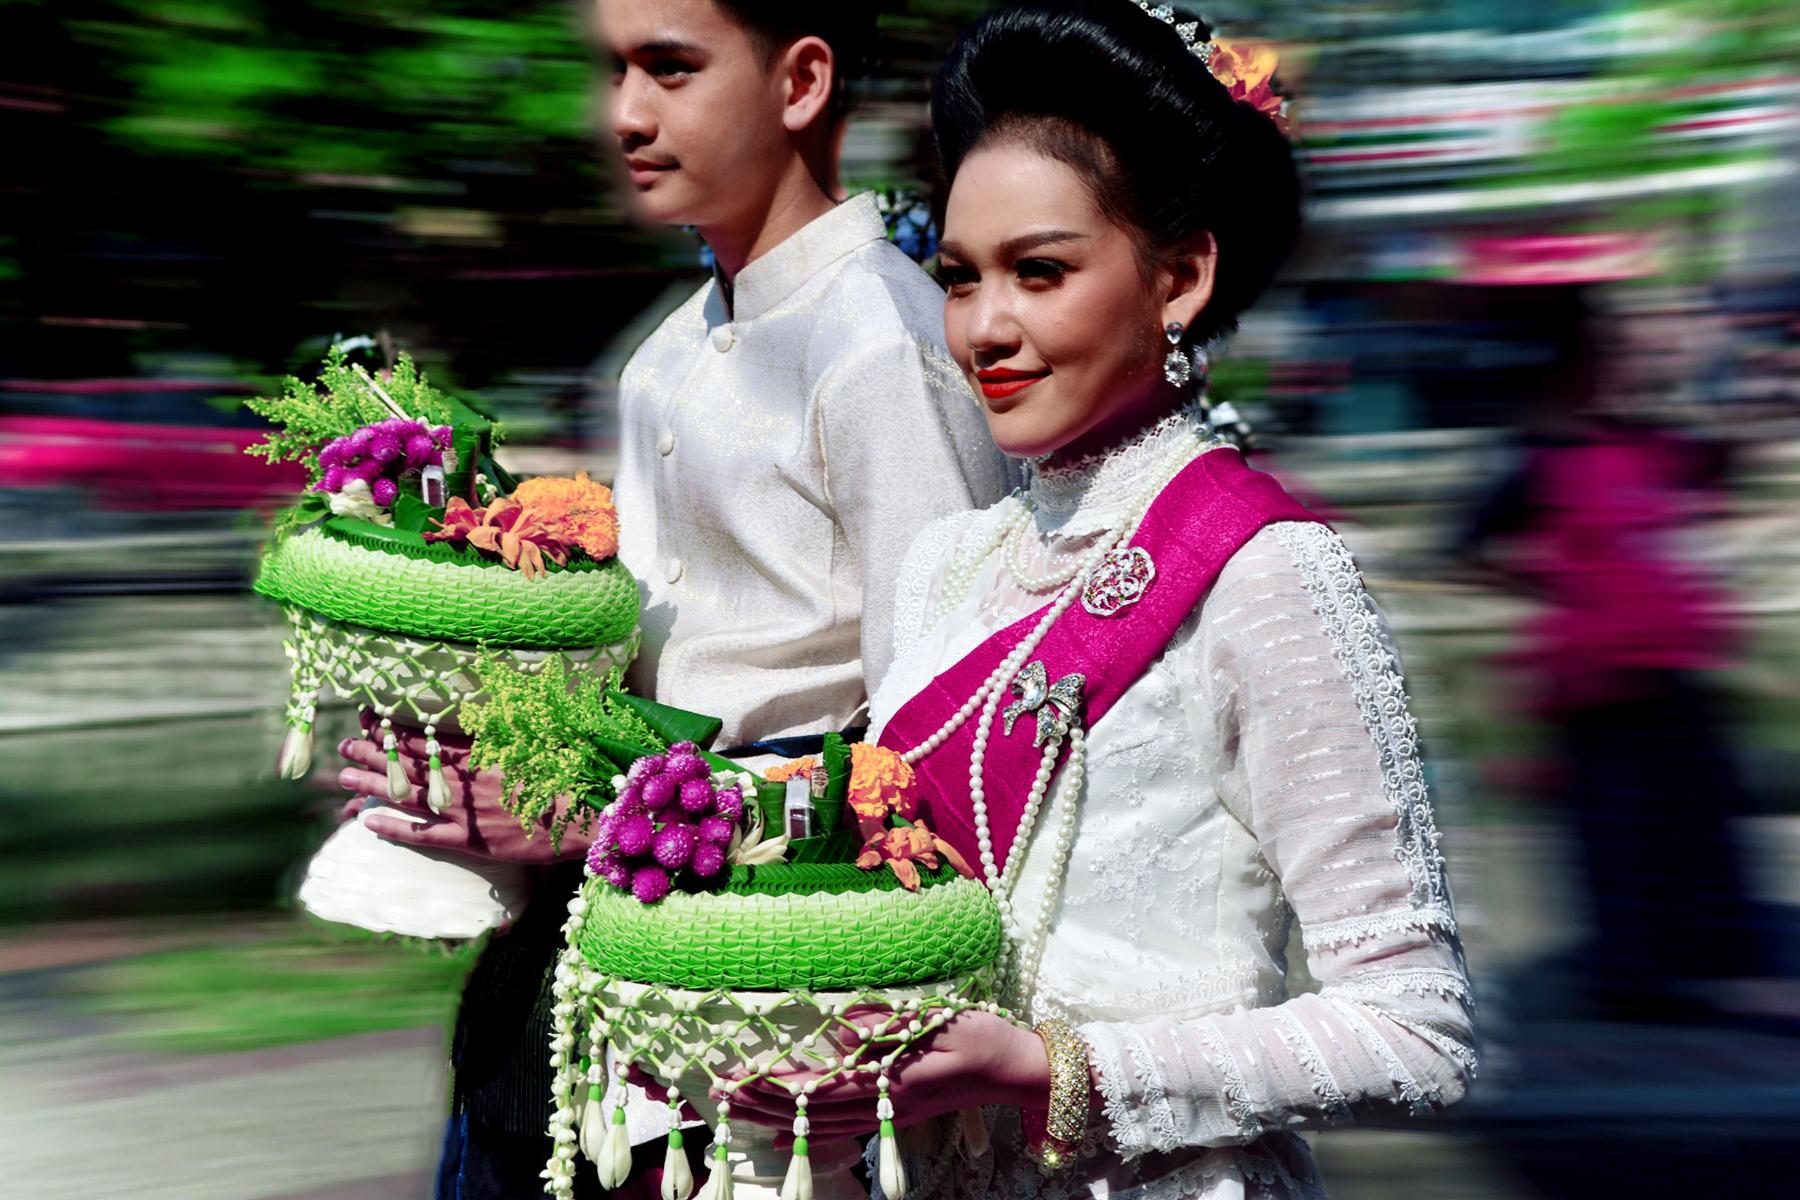 Flower Festival by Bransha Gautier